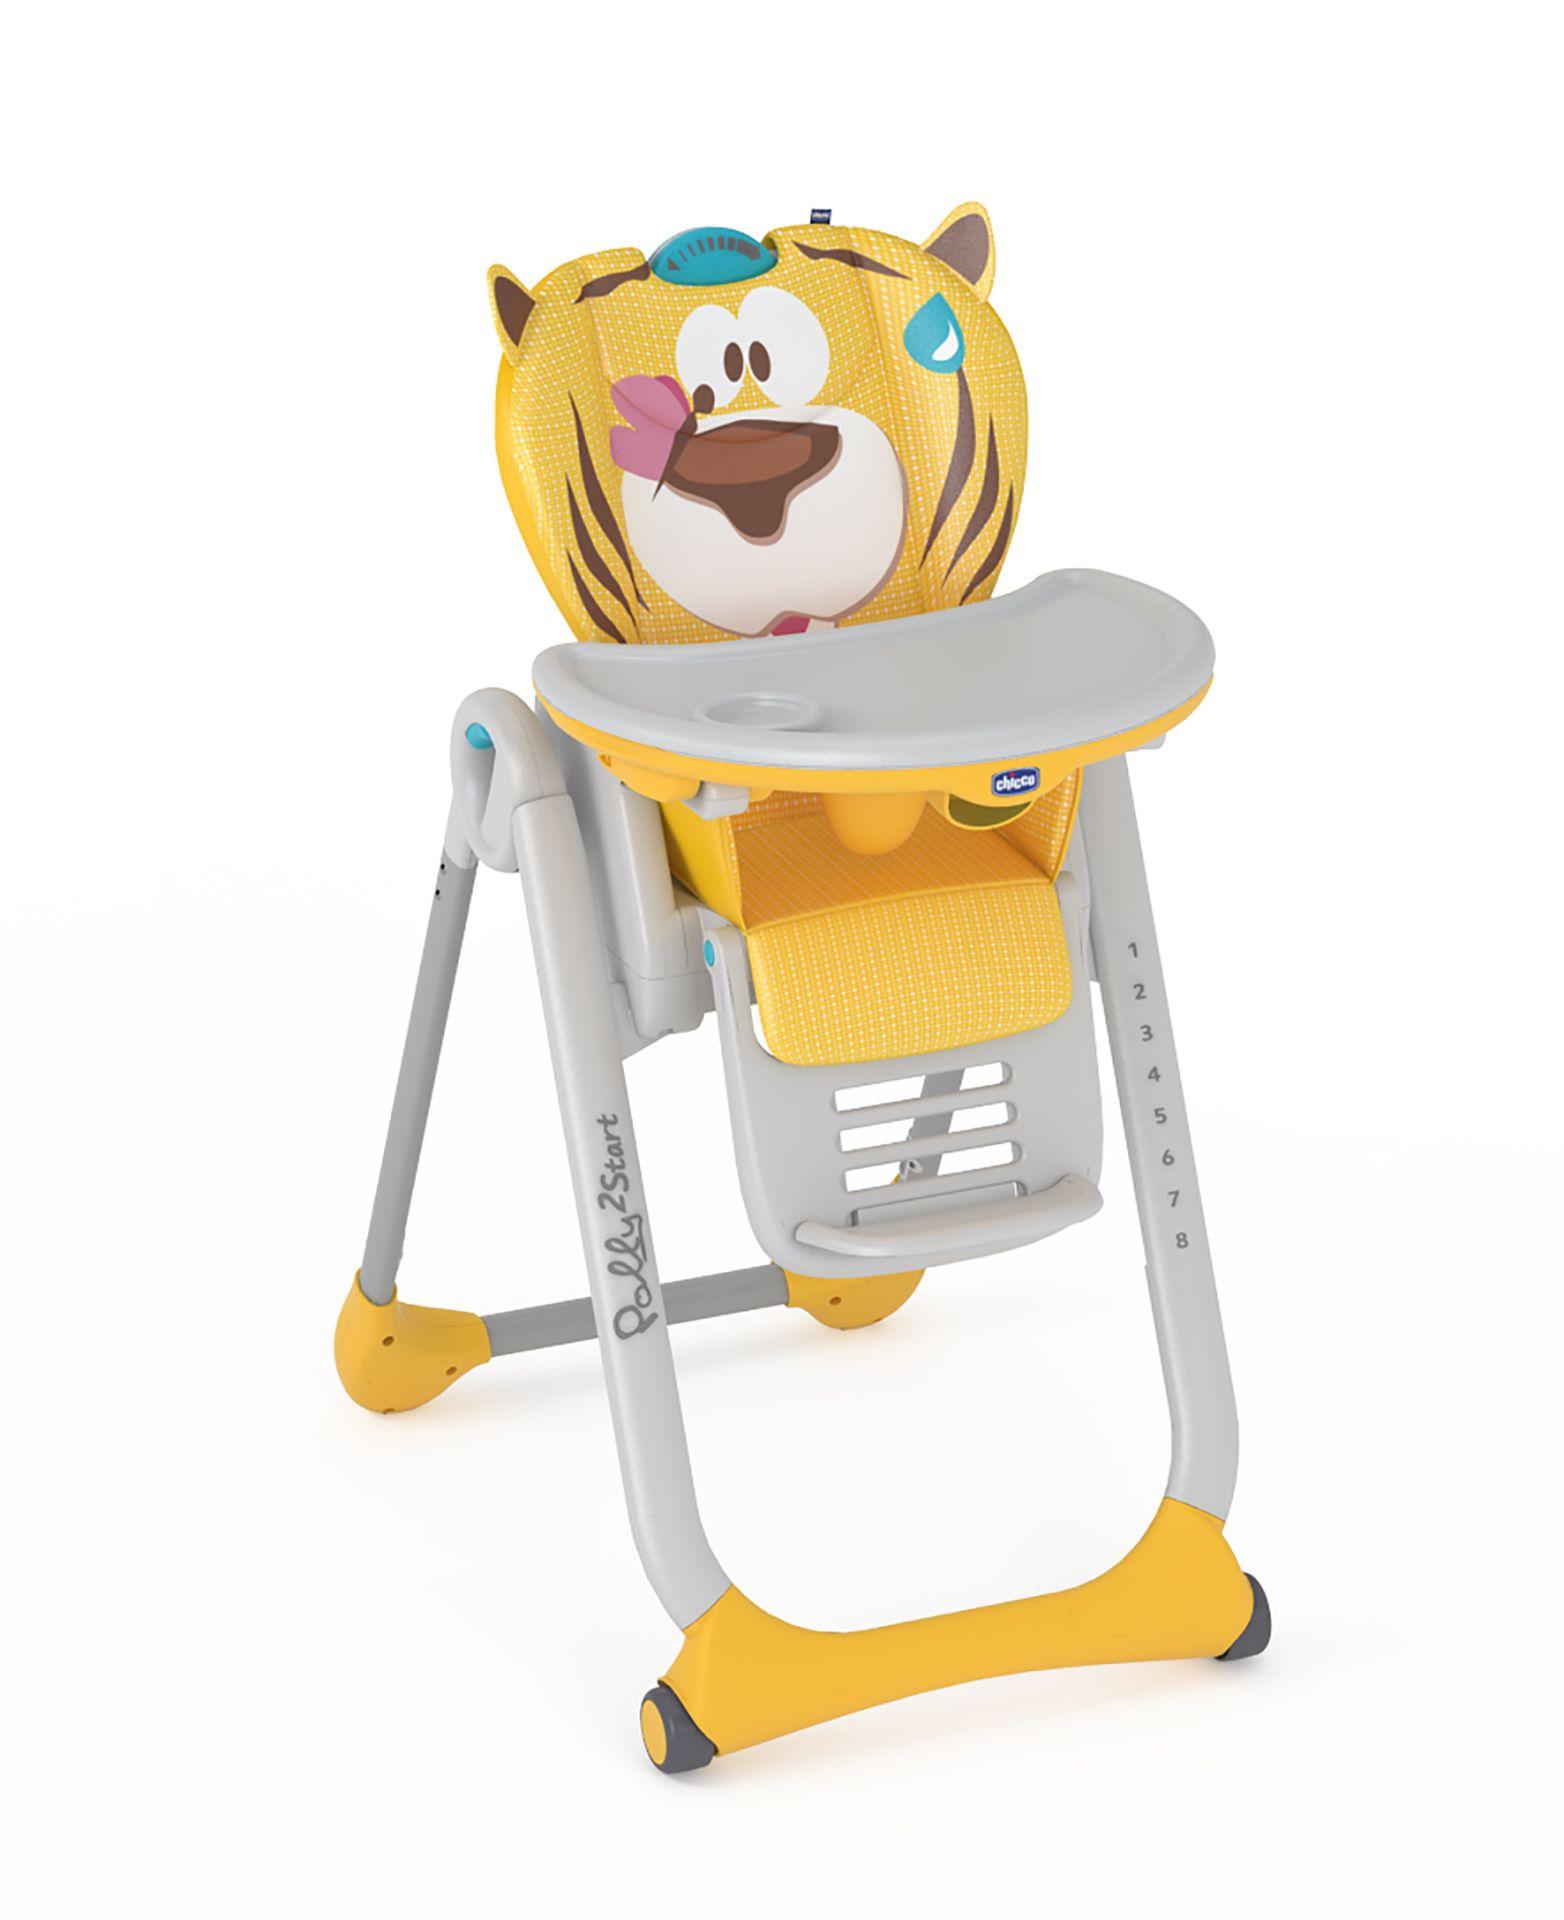 chicco chaise haute polly 2 start 2017 peaceful jungle acheter sur kidsroom alimentation. Black Bedroom Furniture Sets. Home Design Ideas